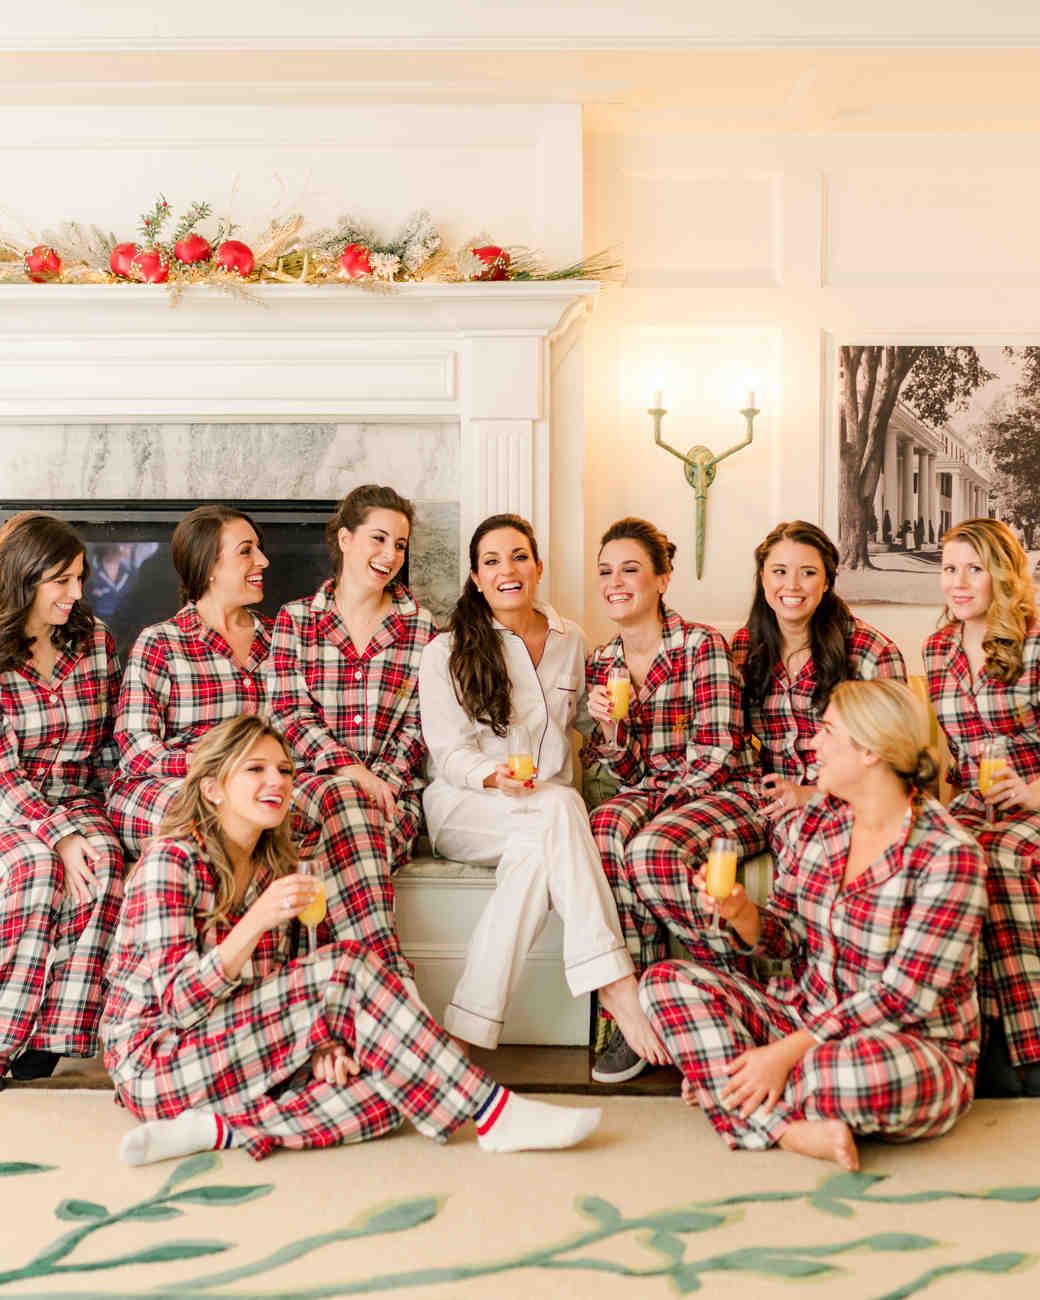 lauren christian christmas wedding plaid pajamas bride bridesmaids getting ready